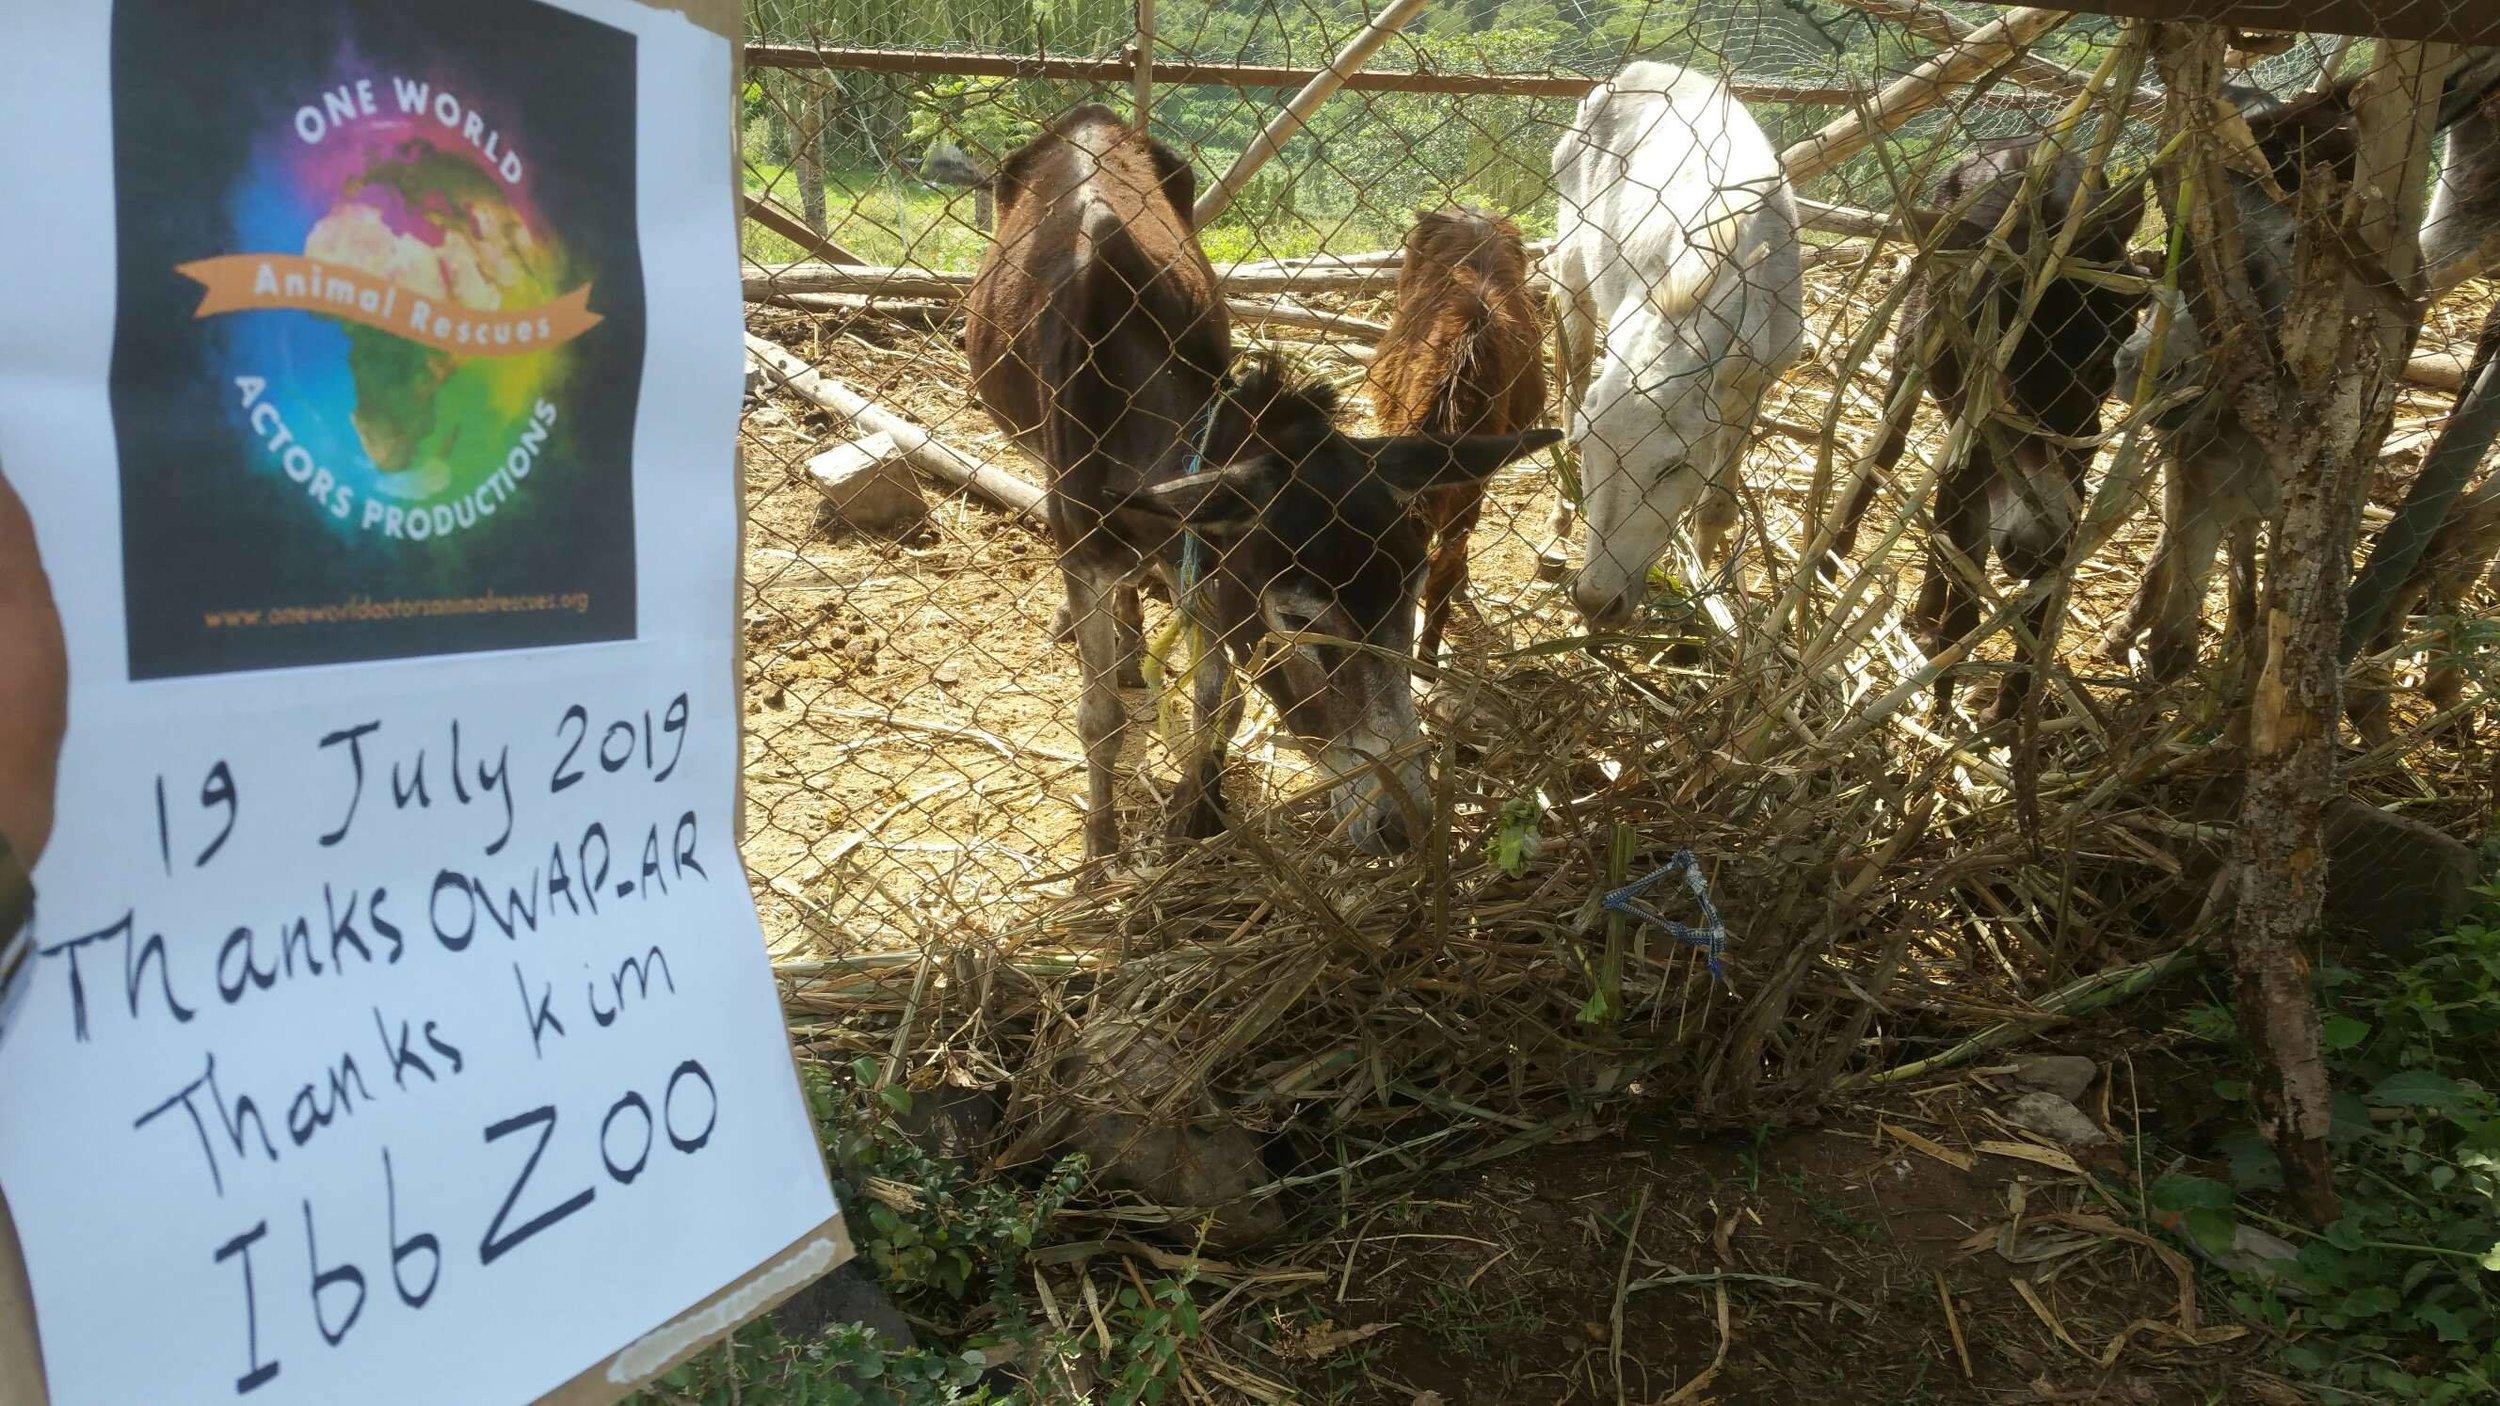 Ibb Zoo 19 July 2019 donkeys getting our fodder OWAP sign pic Dr Al Bukair.jpg